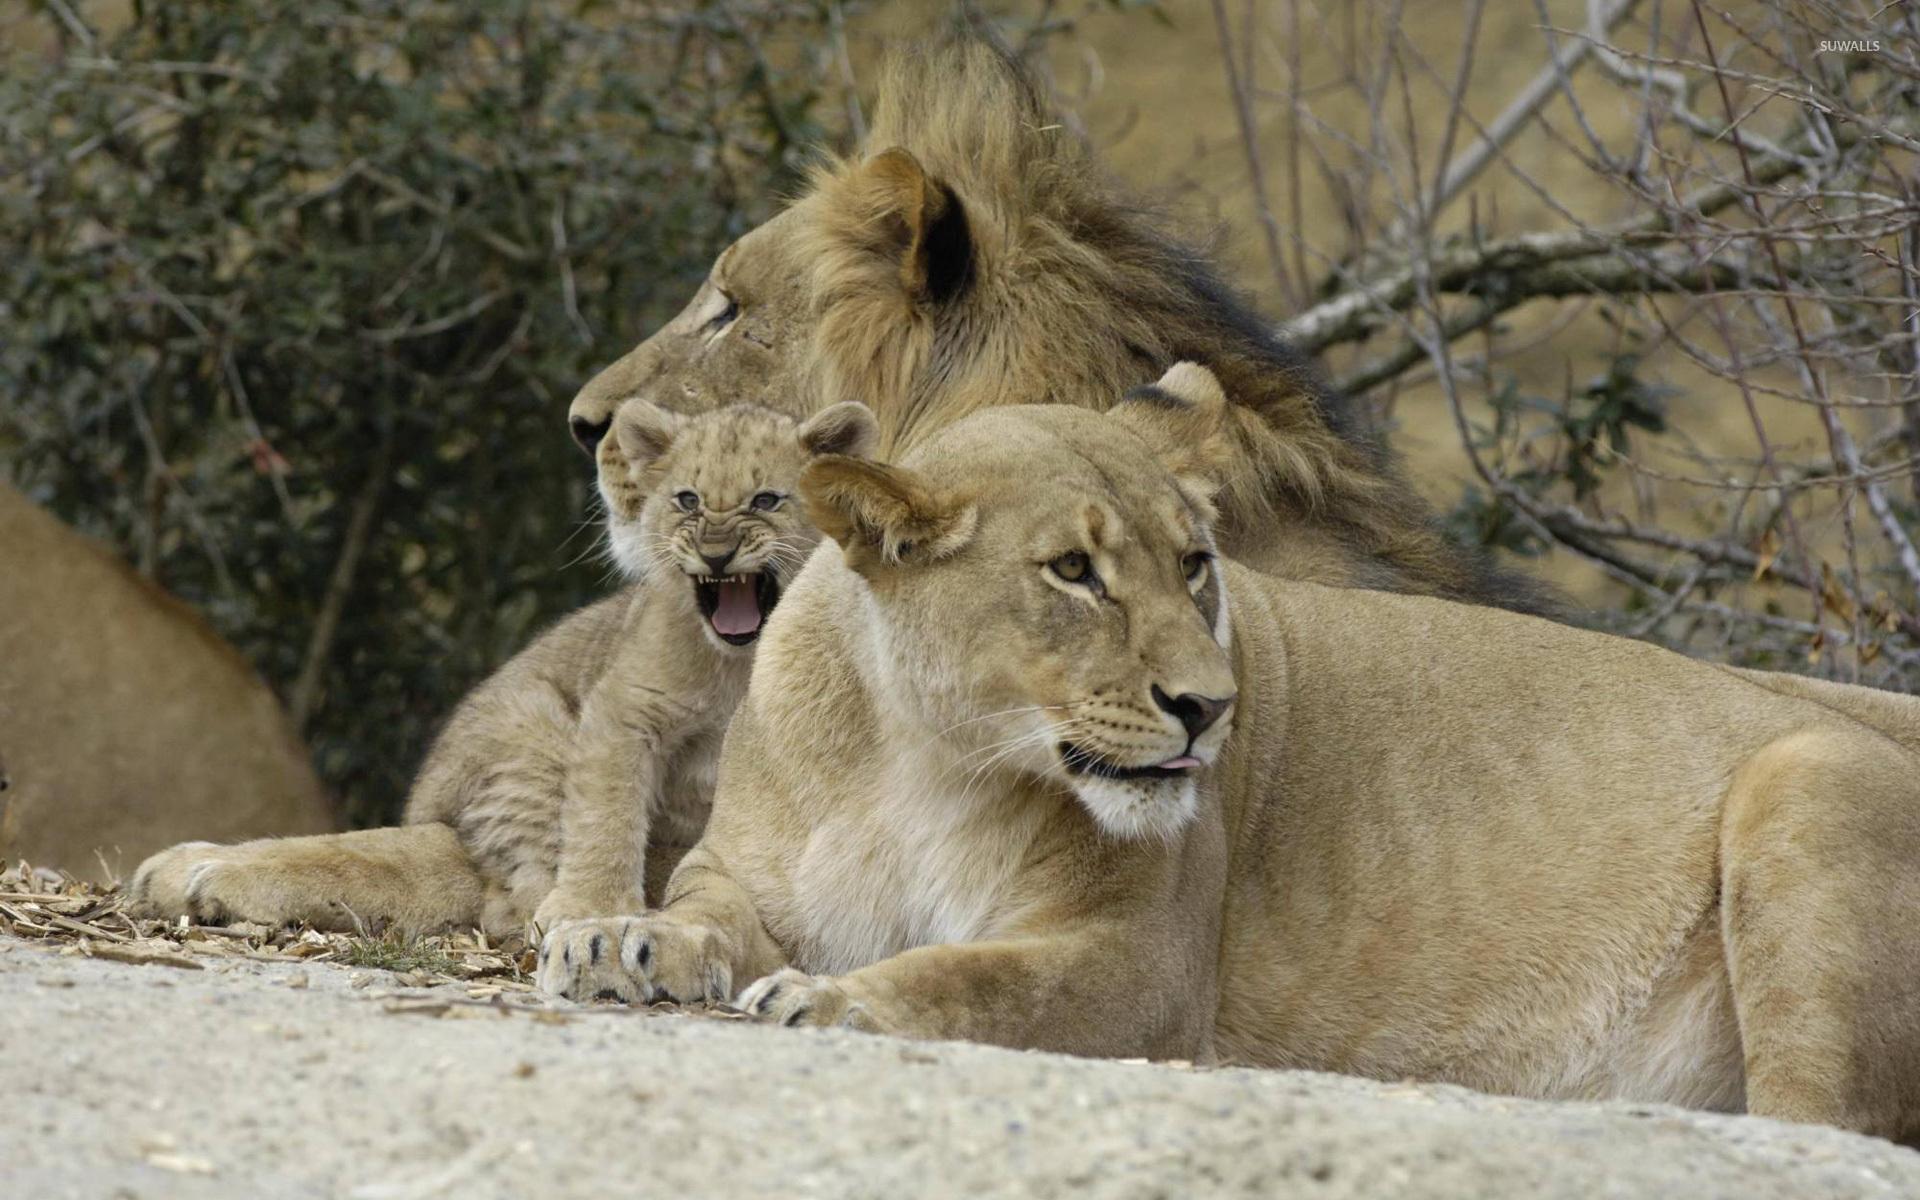 Lion family wallpaper - Animal wallpapers - #7784